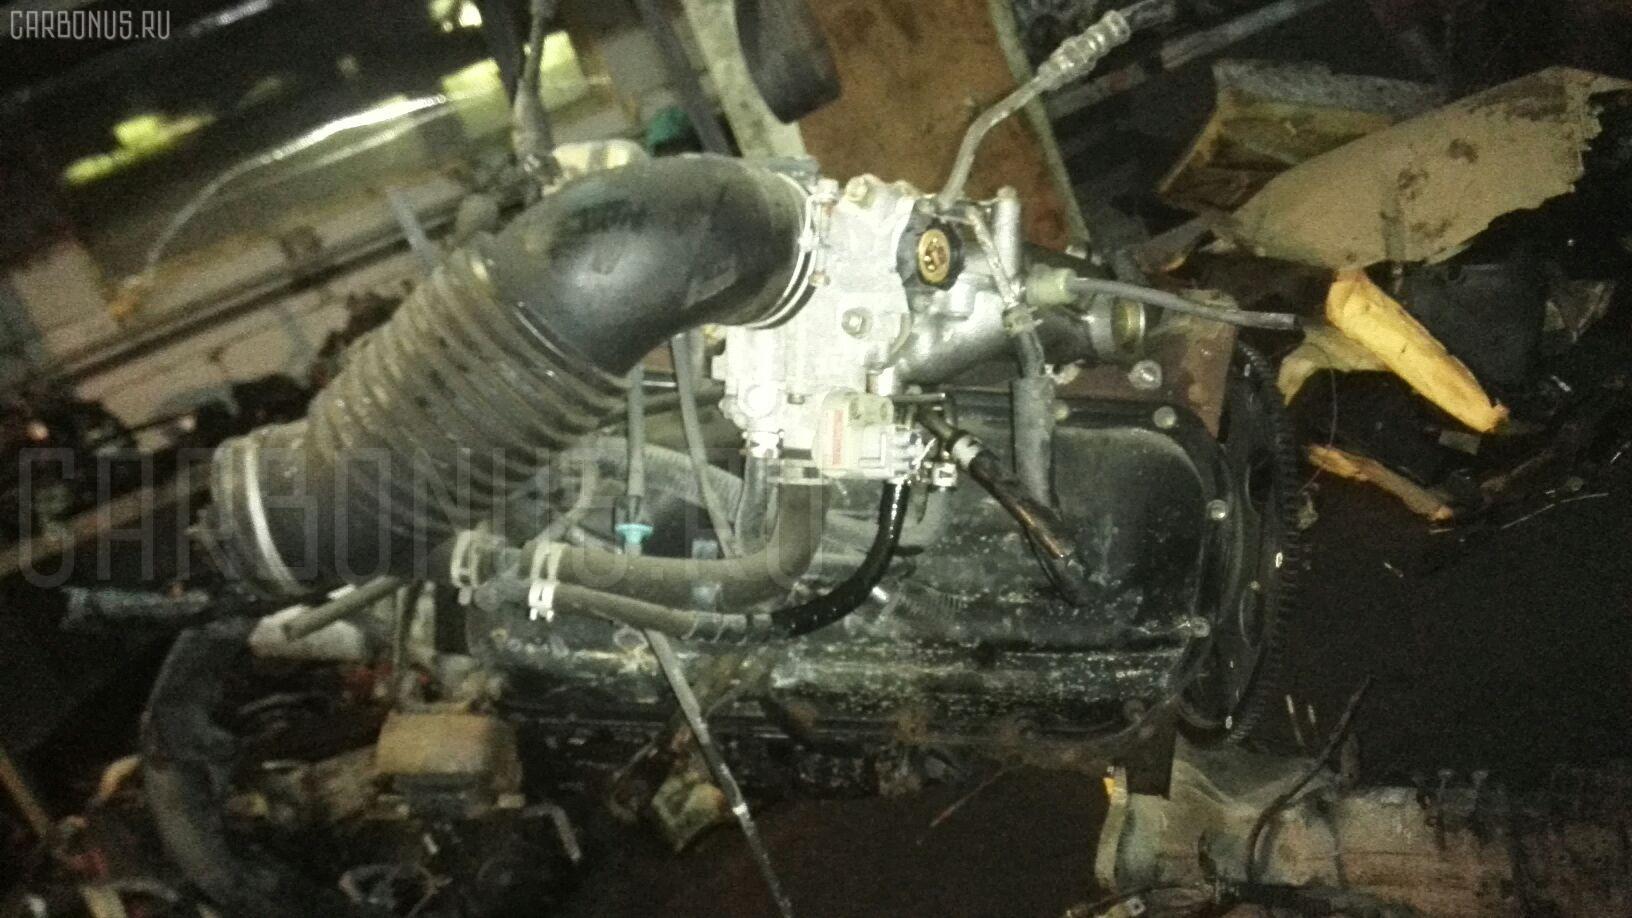 Двигатель TOYOTA ESTIMA EMINA TCR20G 2TZ-FE Фото 1